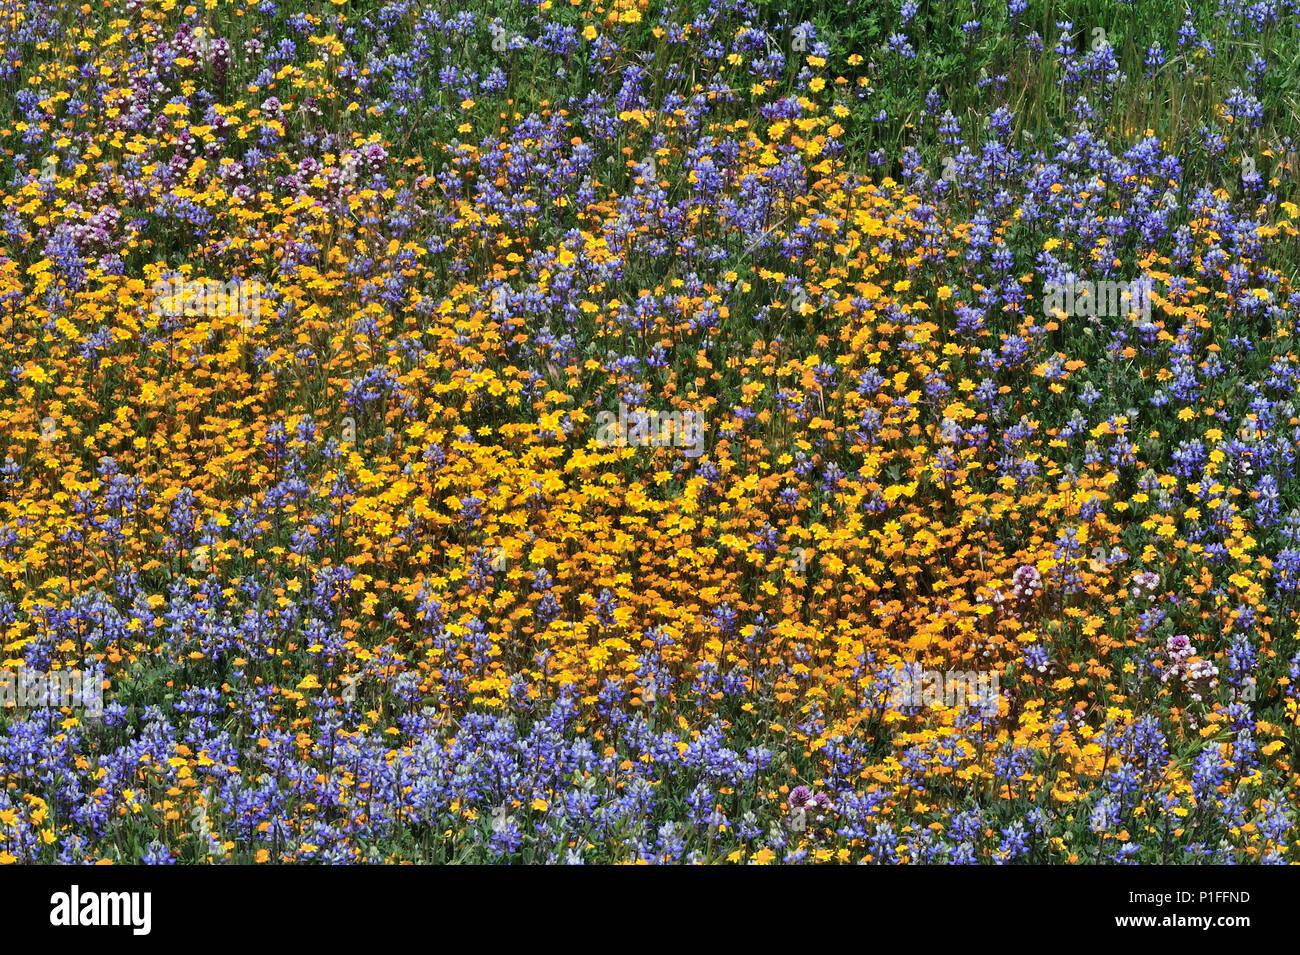 Goldfields, Lasthenia sp., Miniatur, Lupine Lupinus bicolor, Owl's Clover, Castilleja sp., Cuyamaca Rancho State Park, CA 080518_30421 Stockbild